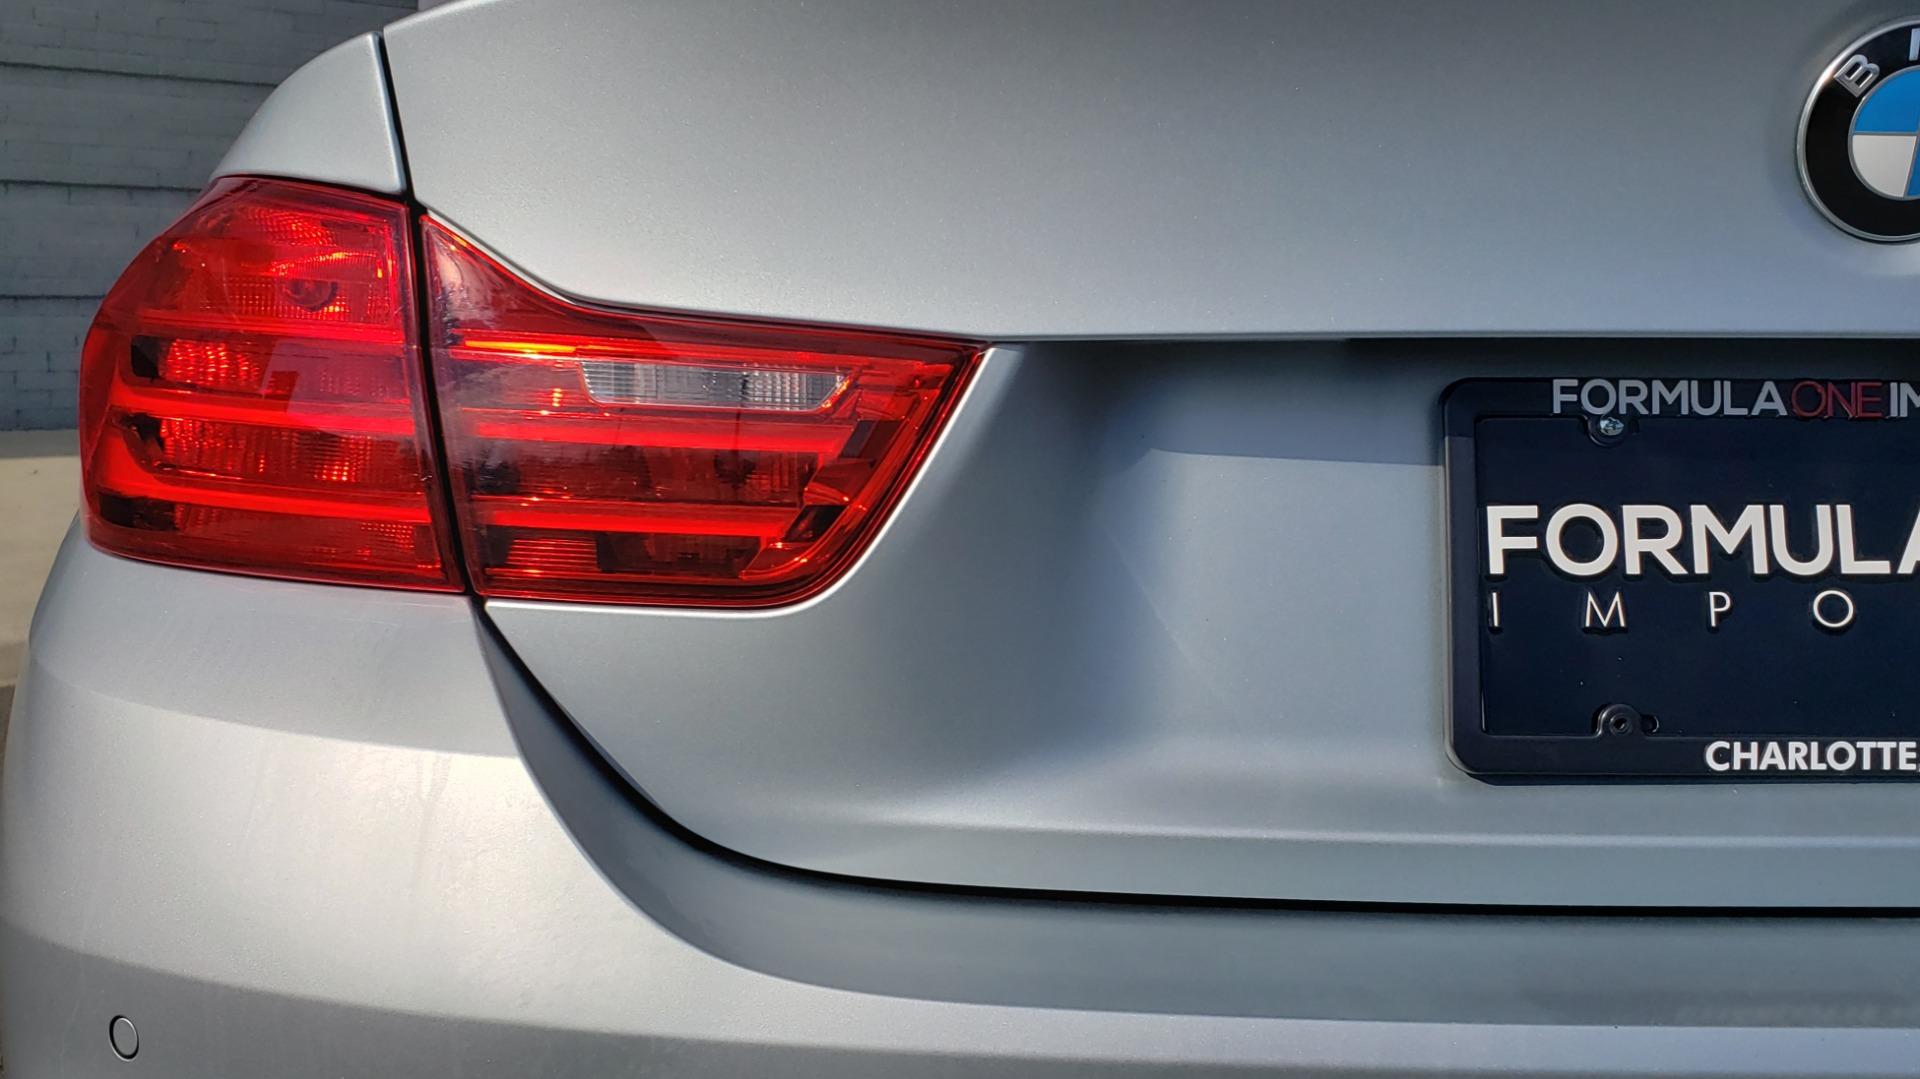 Used 2015 BMW M4 COUPE / EXEC PKG / DRVR ASST PLUS / LIGHTING / M-SUSPENSION for sale Sold at Formula Imports in Charlotte NC 28227 34